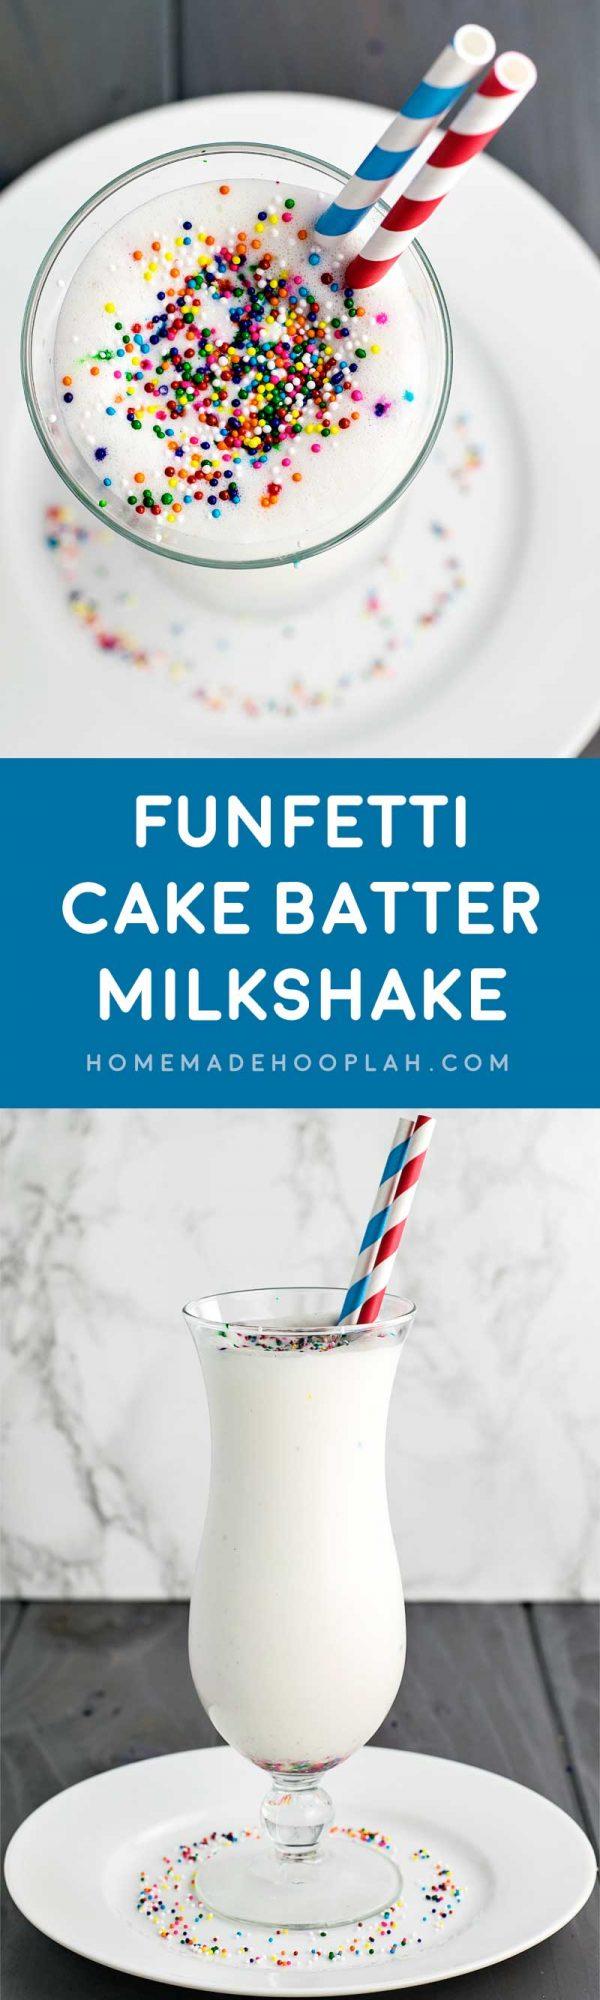 Funfetti Cake Batter Milkshake! A festive milkshake that's only 4 ingredients: creamy ice cream, rich cake mix, milk, and festive sprinkles. | HomemadeHooplah.com